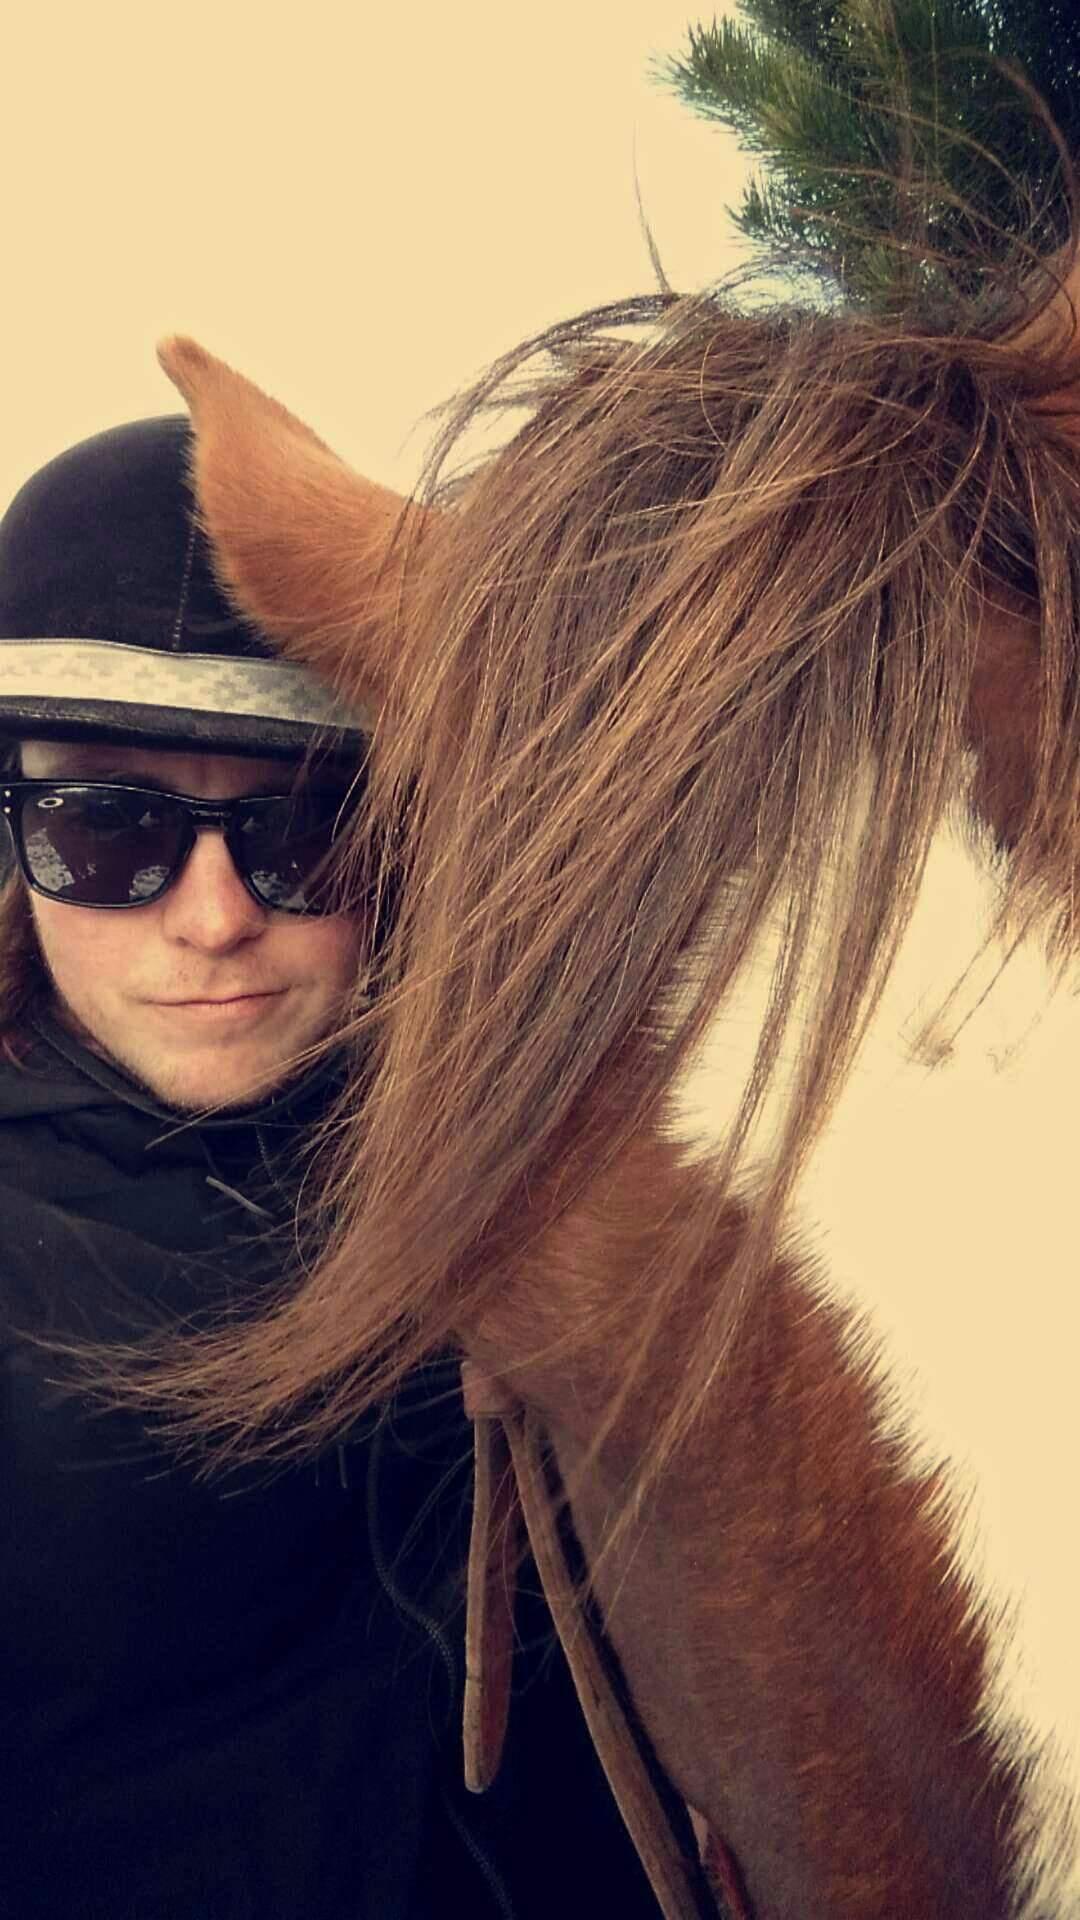 Horse selfie?